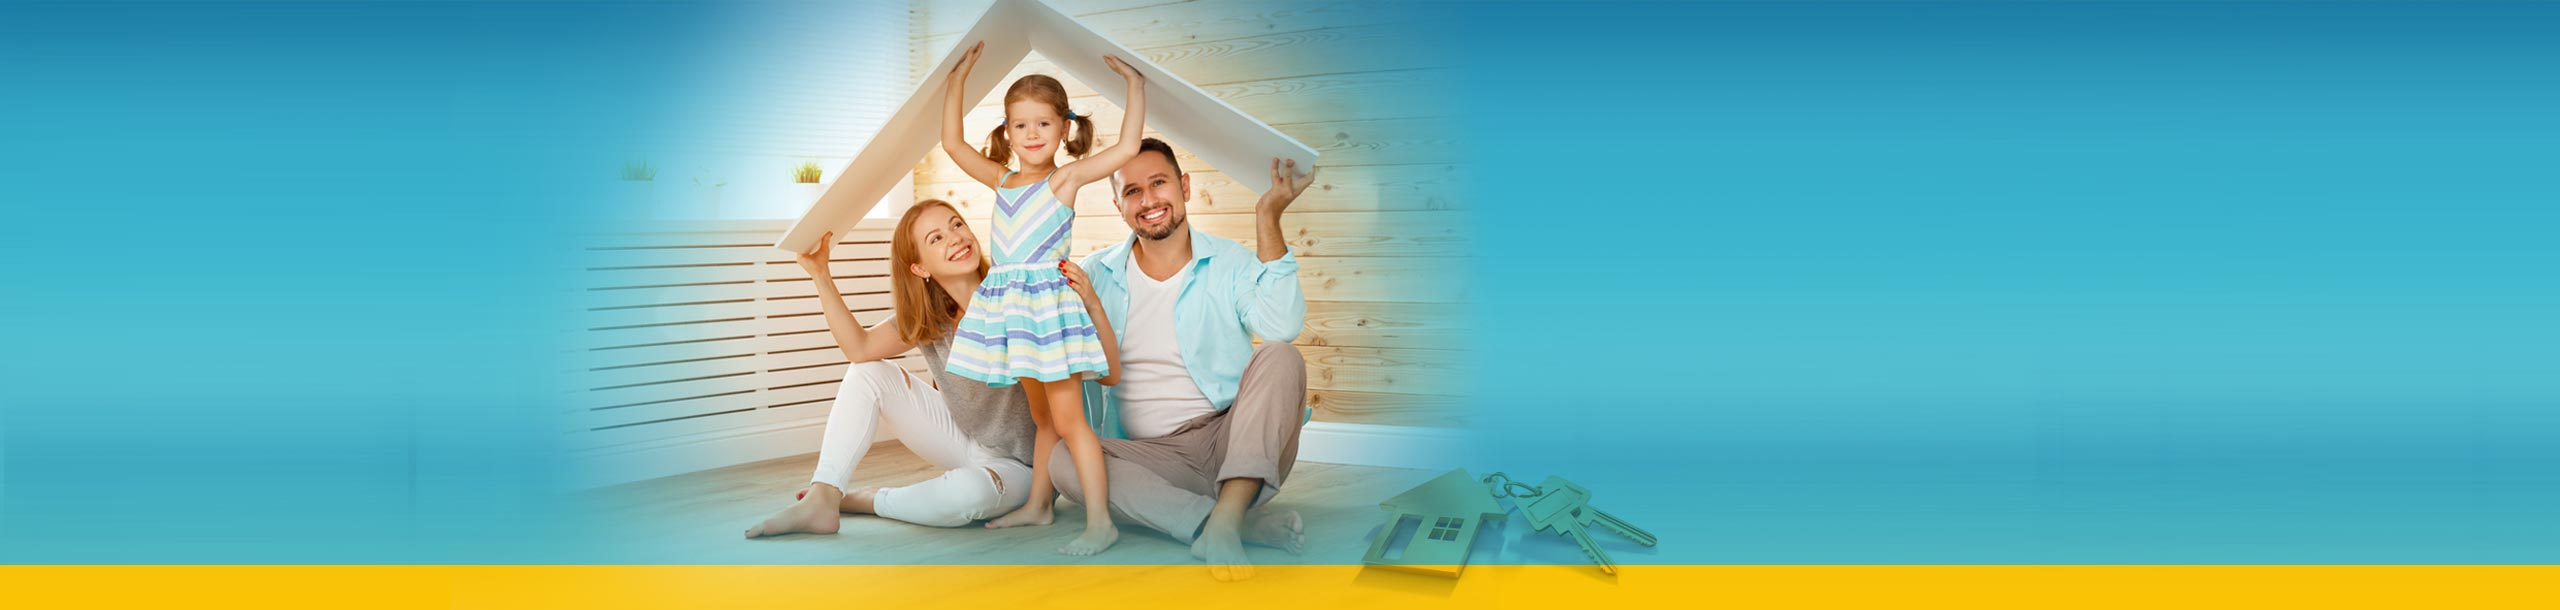 immobilienkredit immobilienfinanzierung zu top konditionen. Black Bedroom Furniture Sets. Home Design Ideas